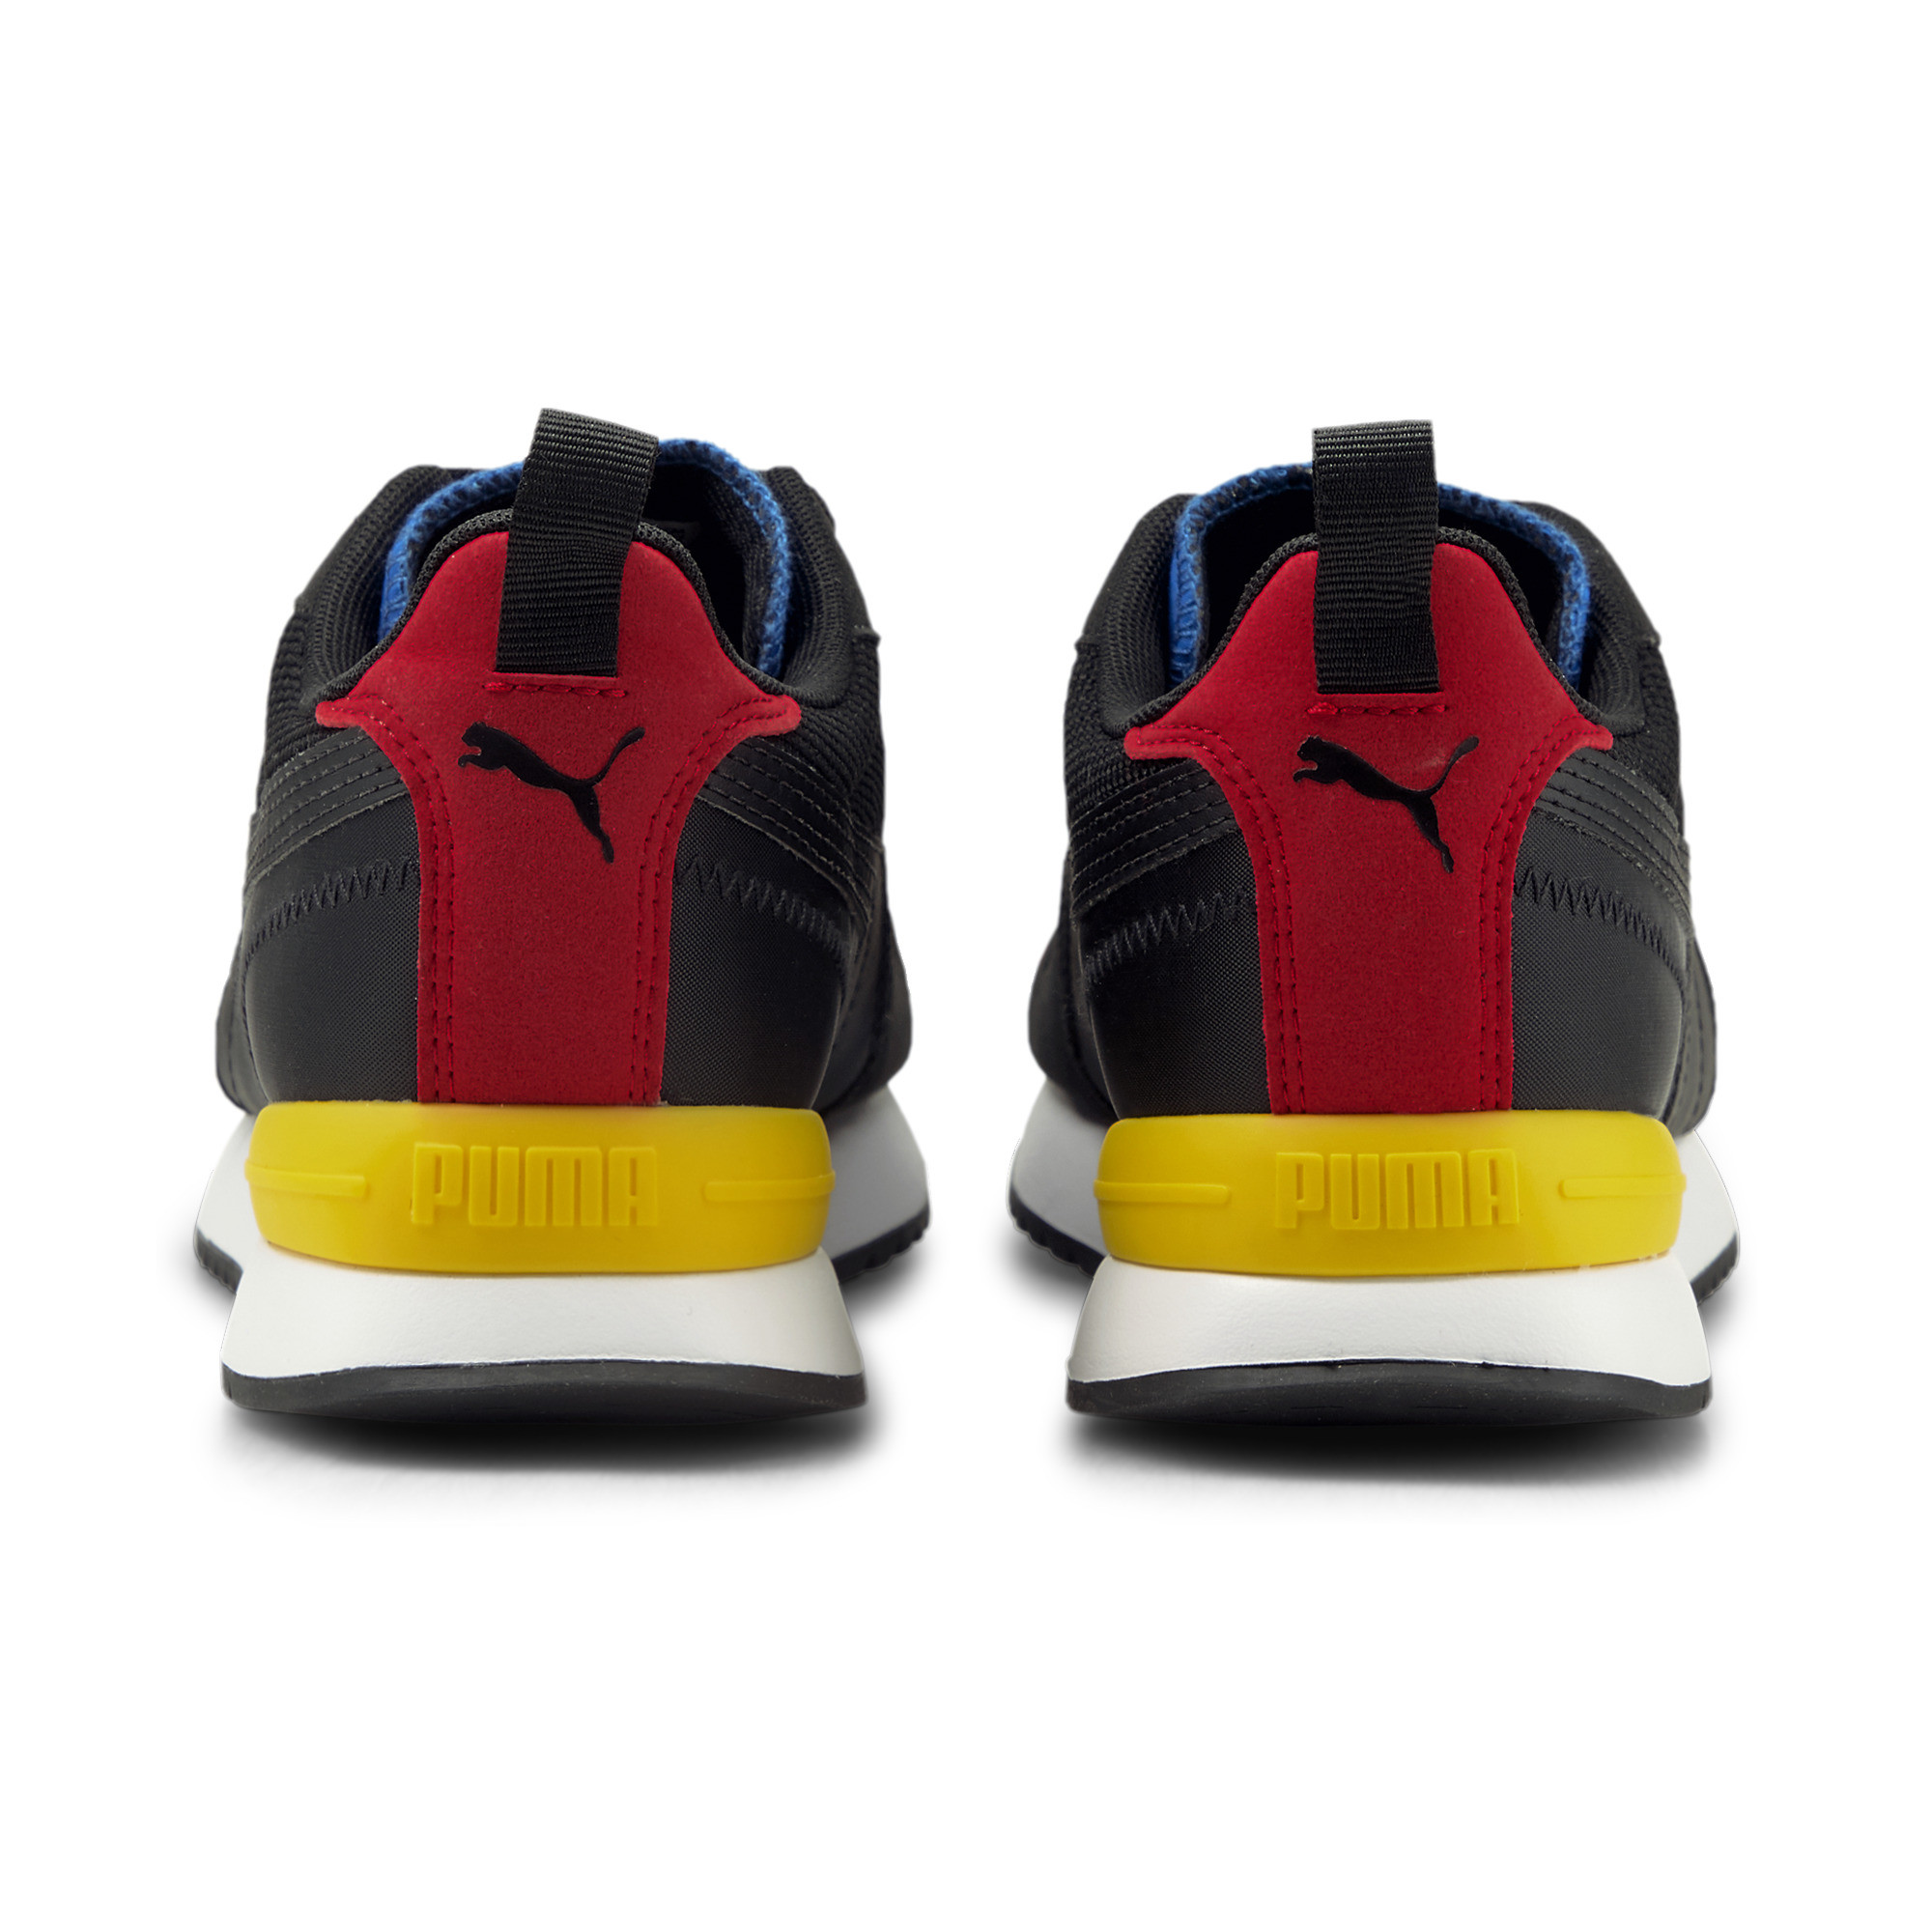 thumbnail 26 - PUMA Men's R78 Sneakers